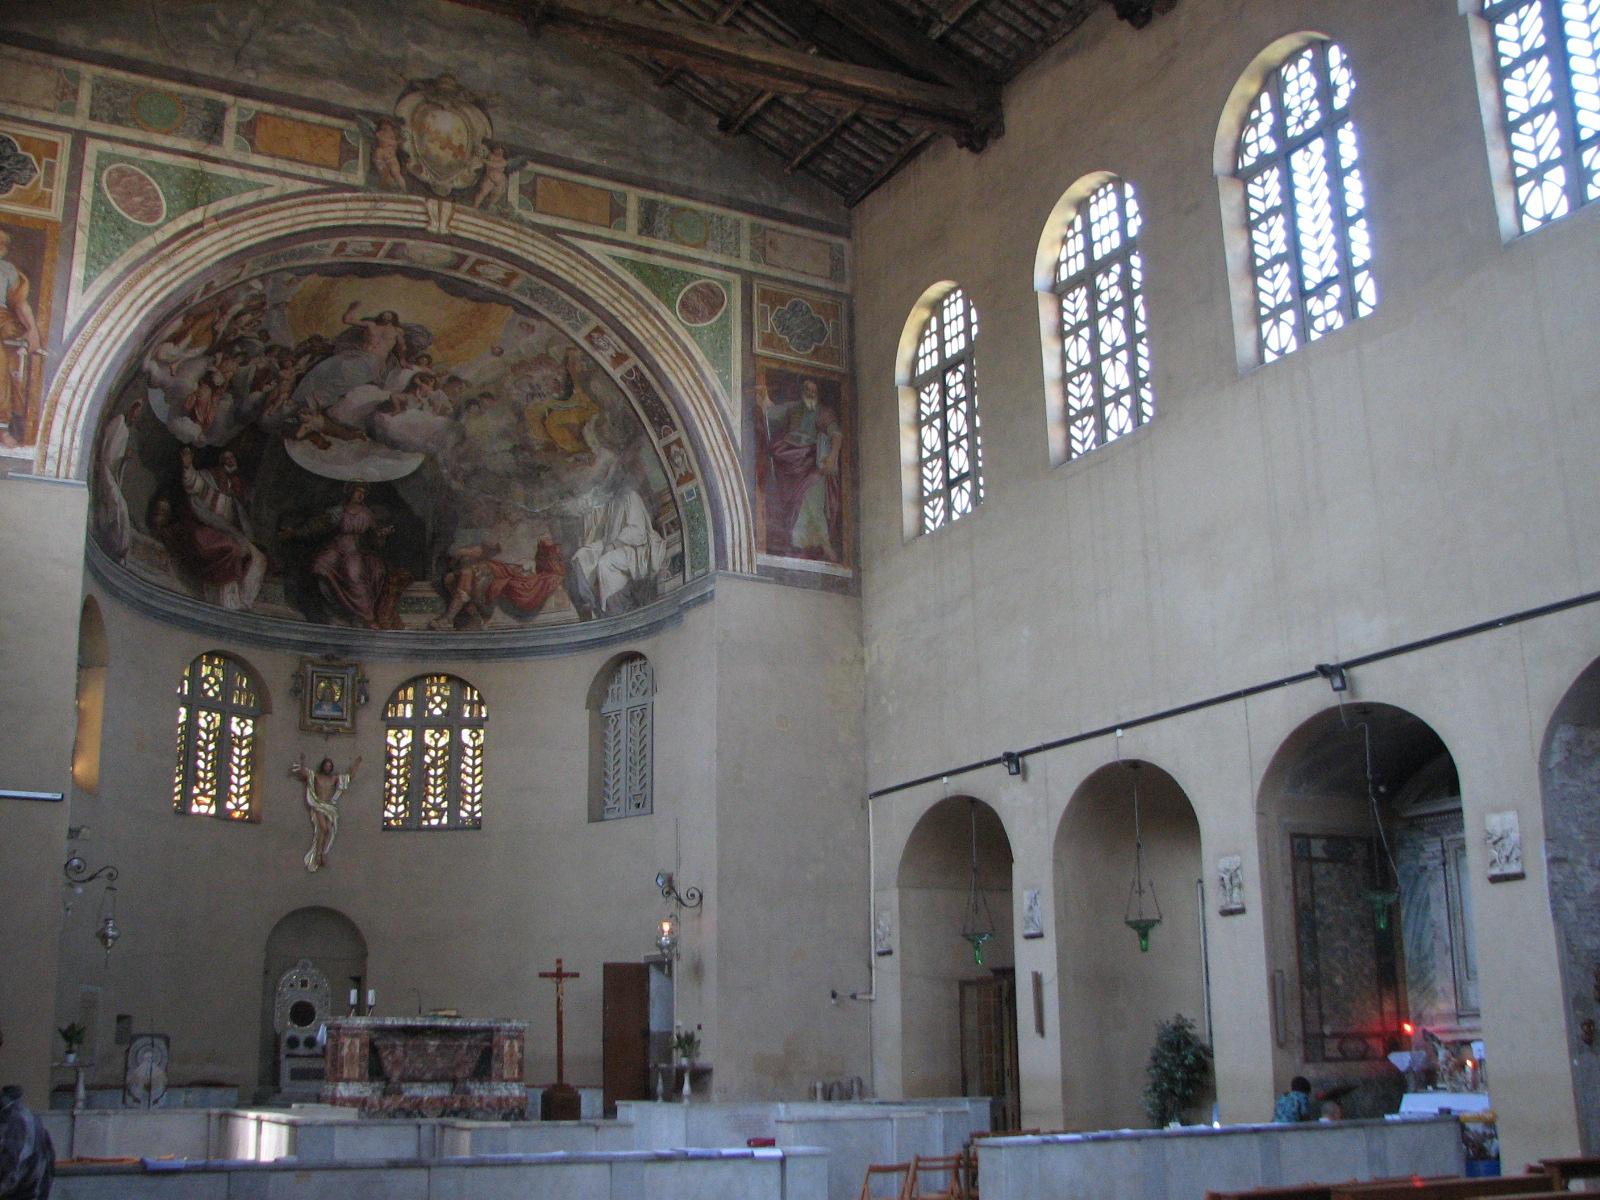 Station Tuesday Lent II: Statio ad St Balbinam